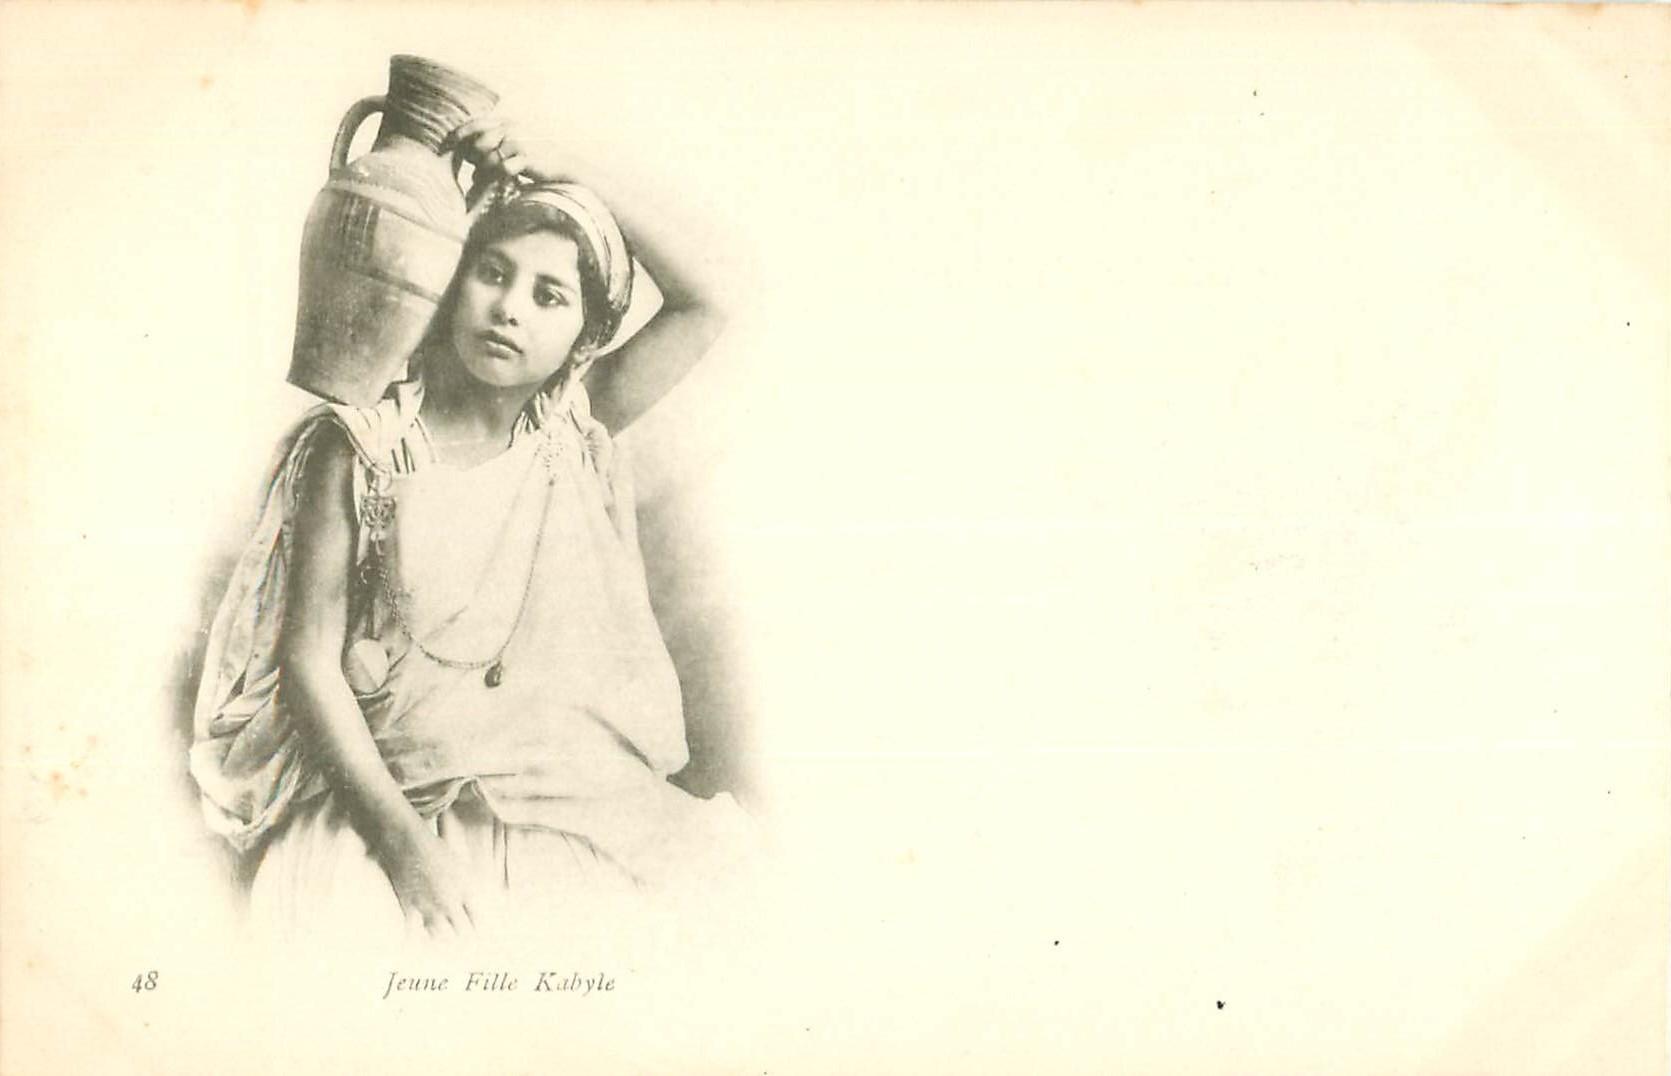 WW ALGERIE. Jeune Fille Kabyle vers 1900